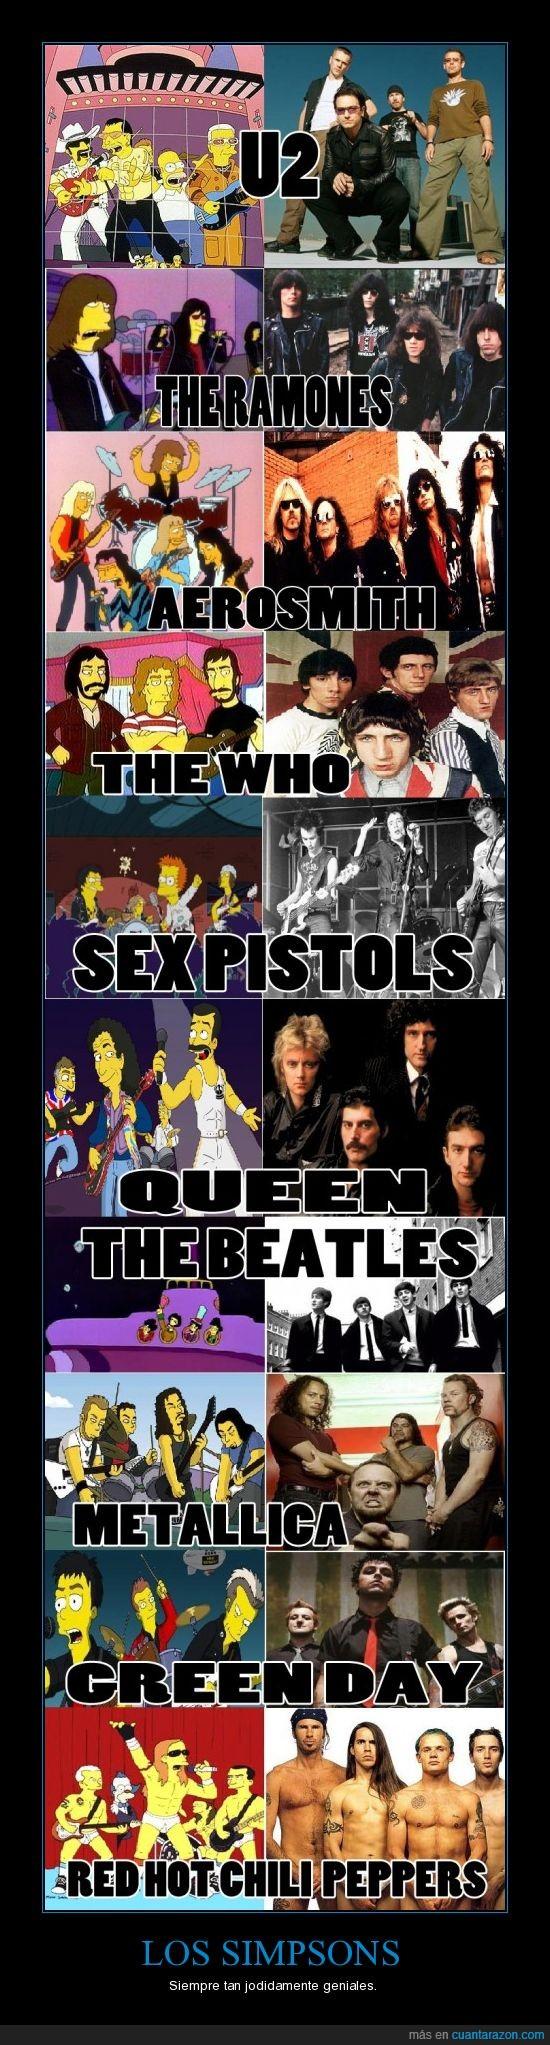 grupos,los,musica,rock,simpsons